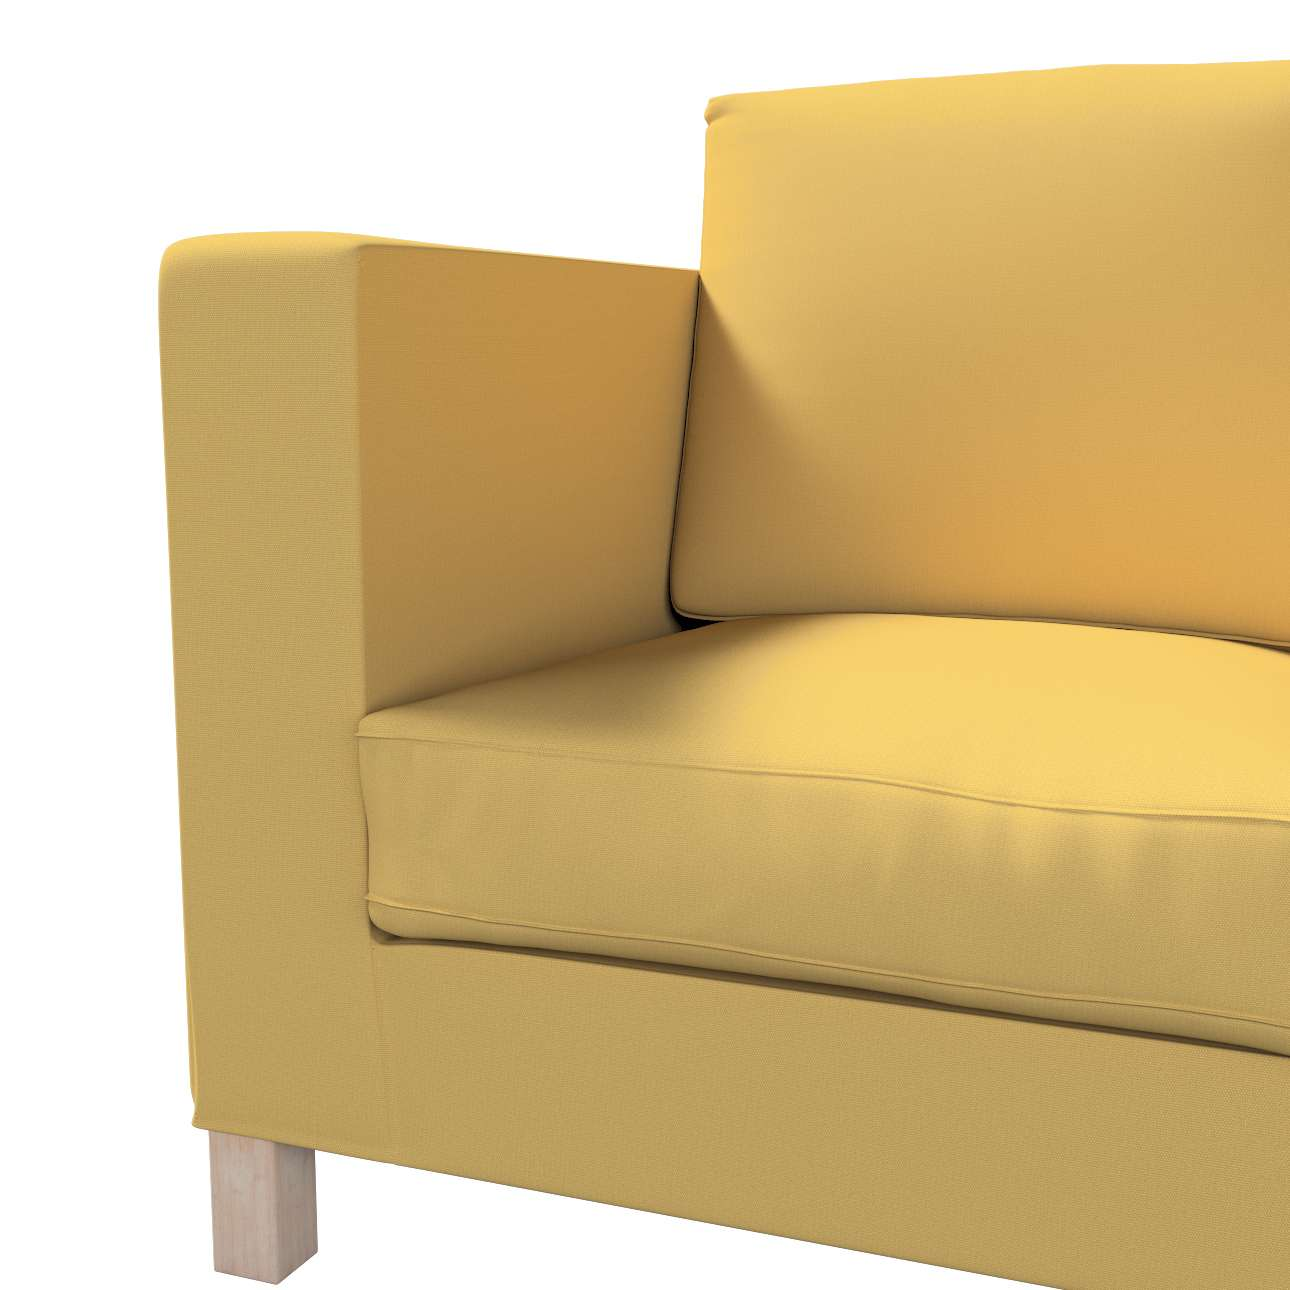 Karlanda klädsel <br>3-sits soffa - kort klädsel i kollektionen Panama Cotton, Tyg: 702-41